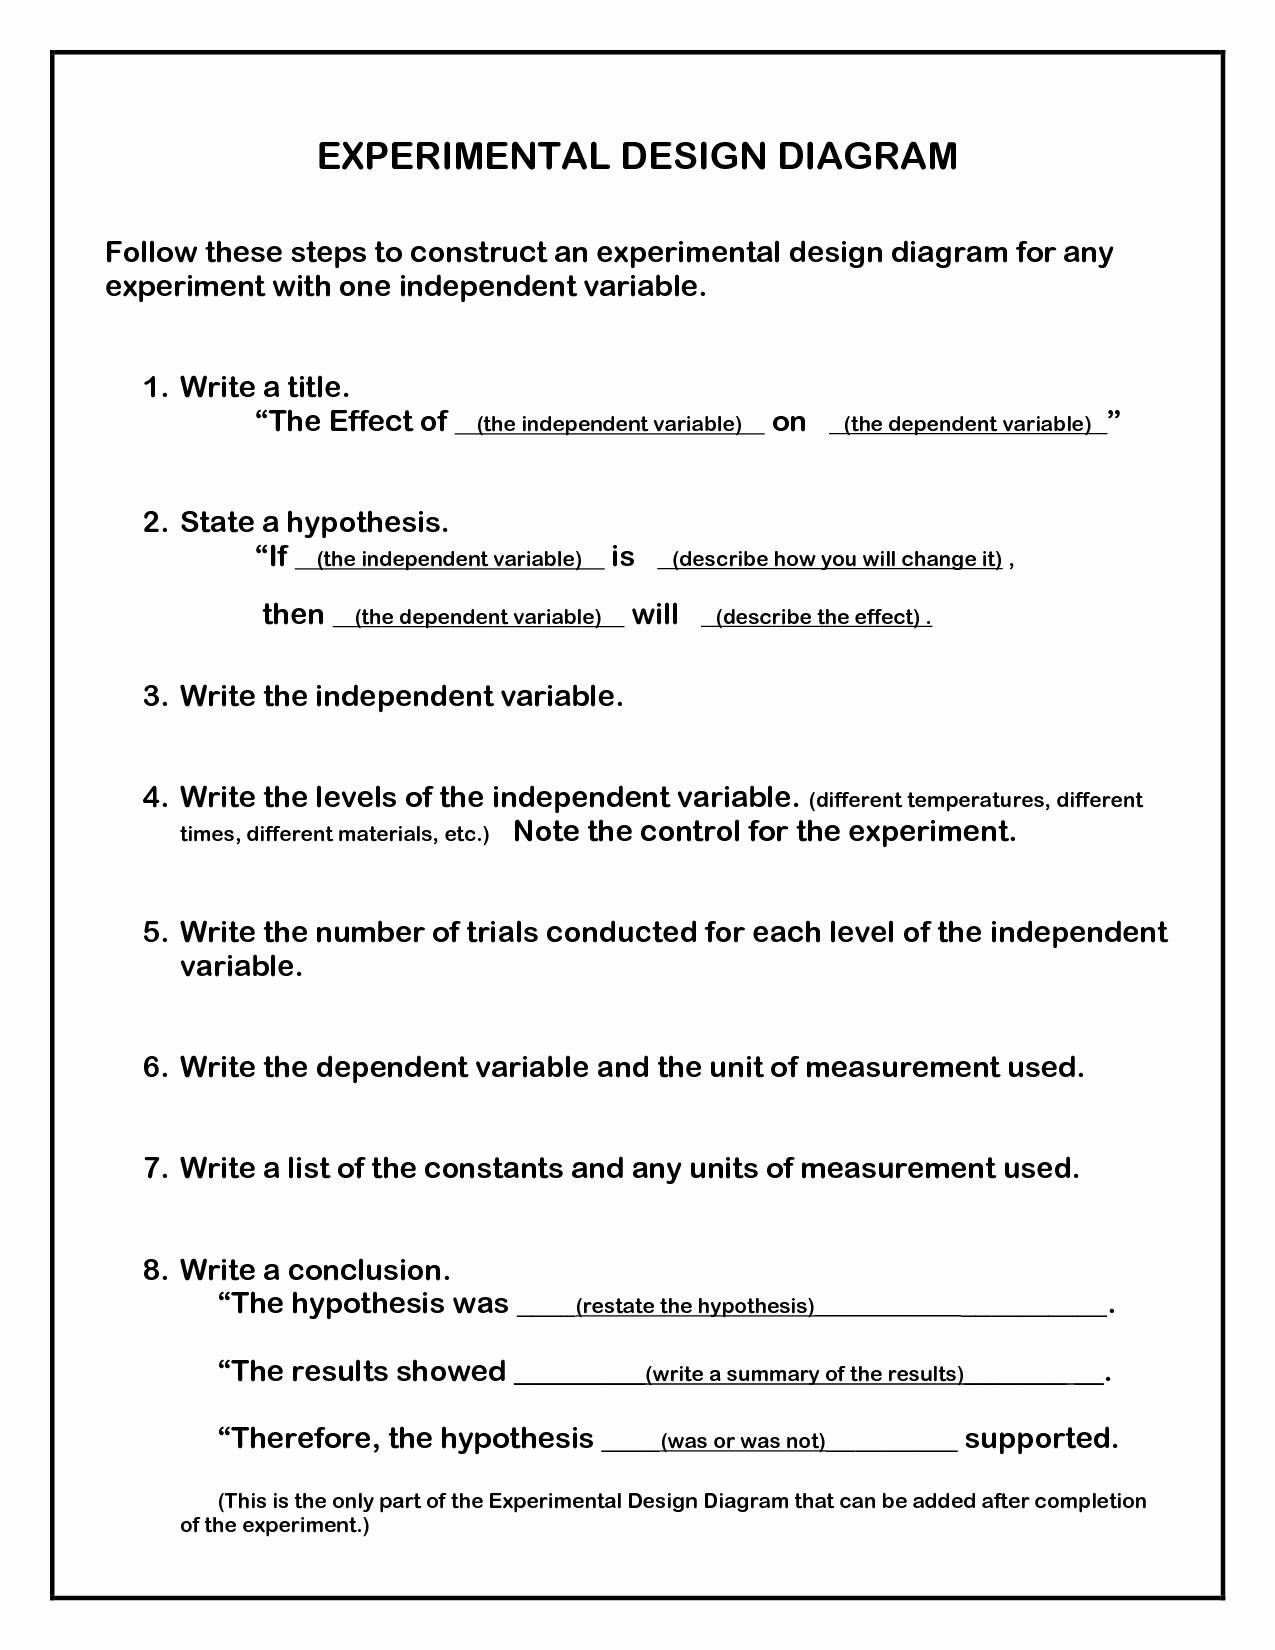 experimental design worksheet answers new worksheet science worksheets middle school grass fedjp of experimental design worksheet answers